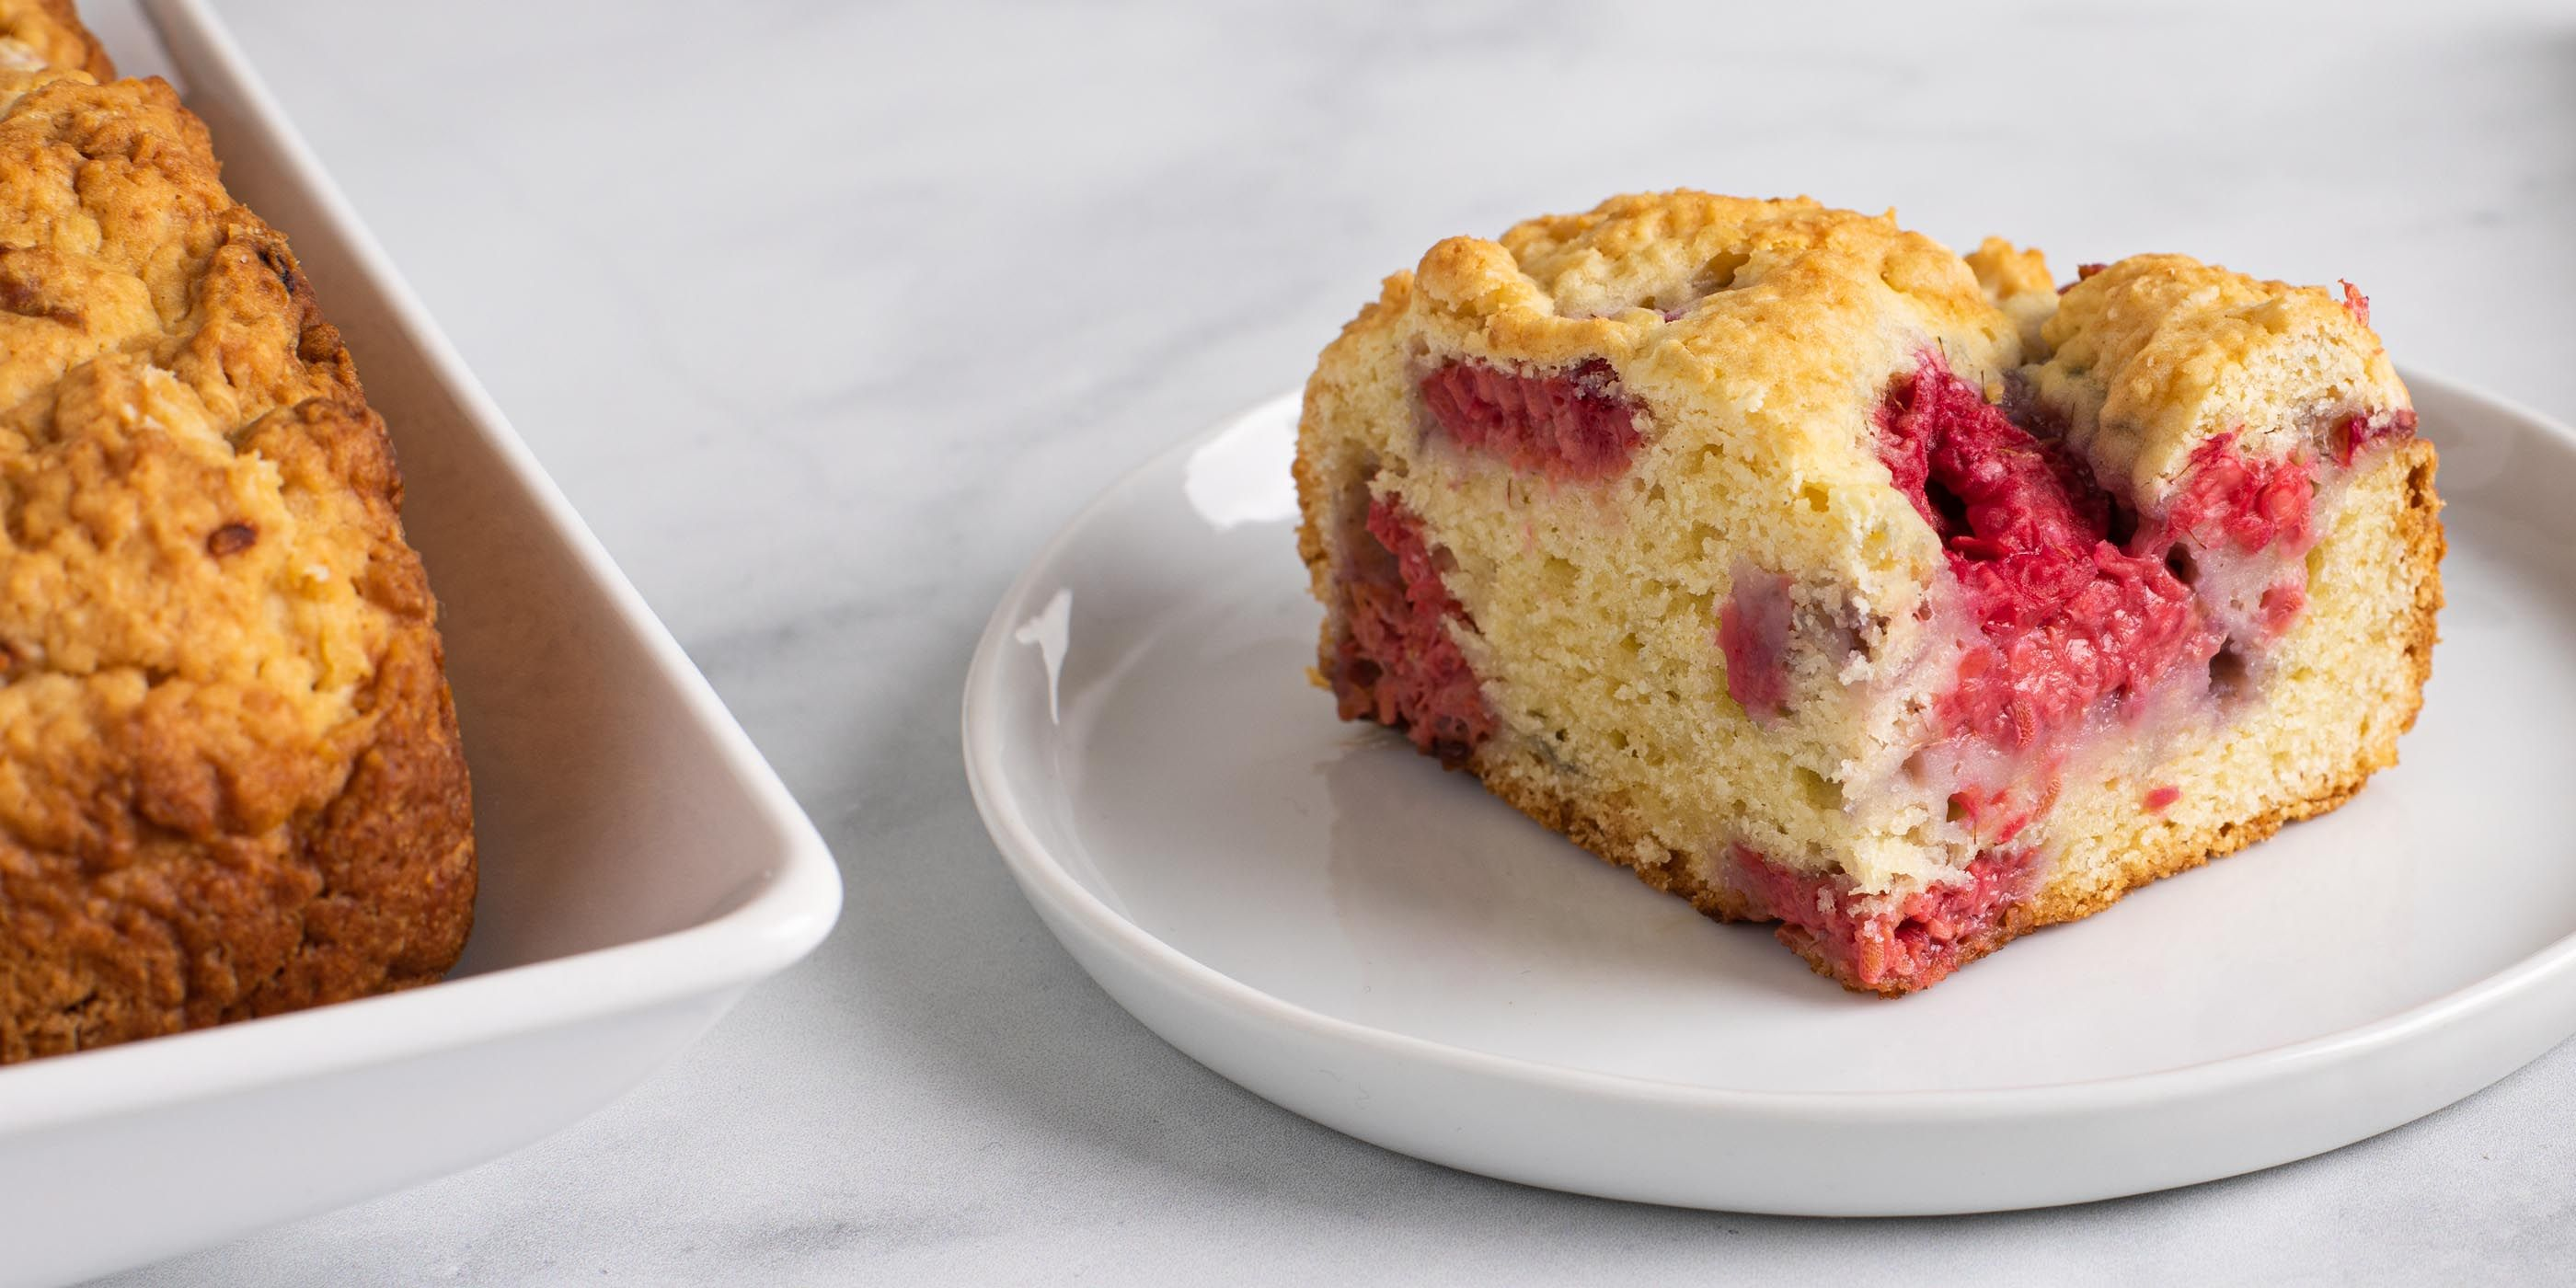 Raspberry Sour Cream Coffee Cake Recipe No Calorie Sweetener Sugar Substitute Splenda Sweeteners Recipe In 2020 Coffee Cake Recipes Sour Cream Coffee Cake Coffee Cake